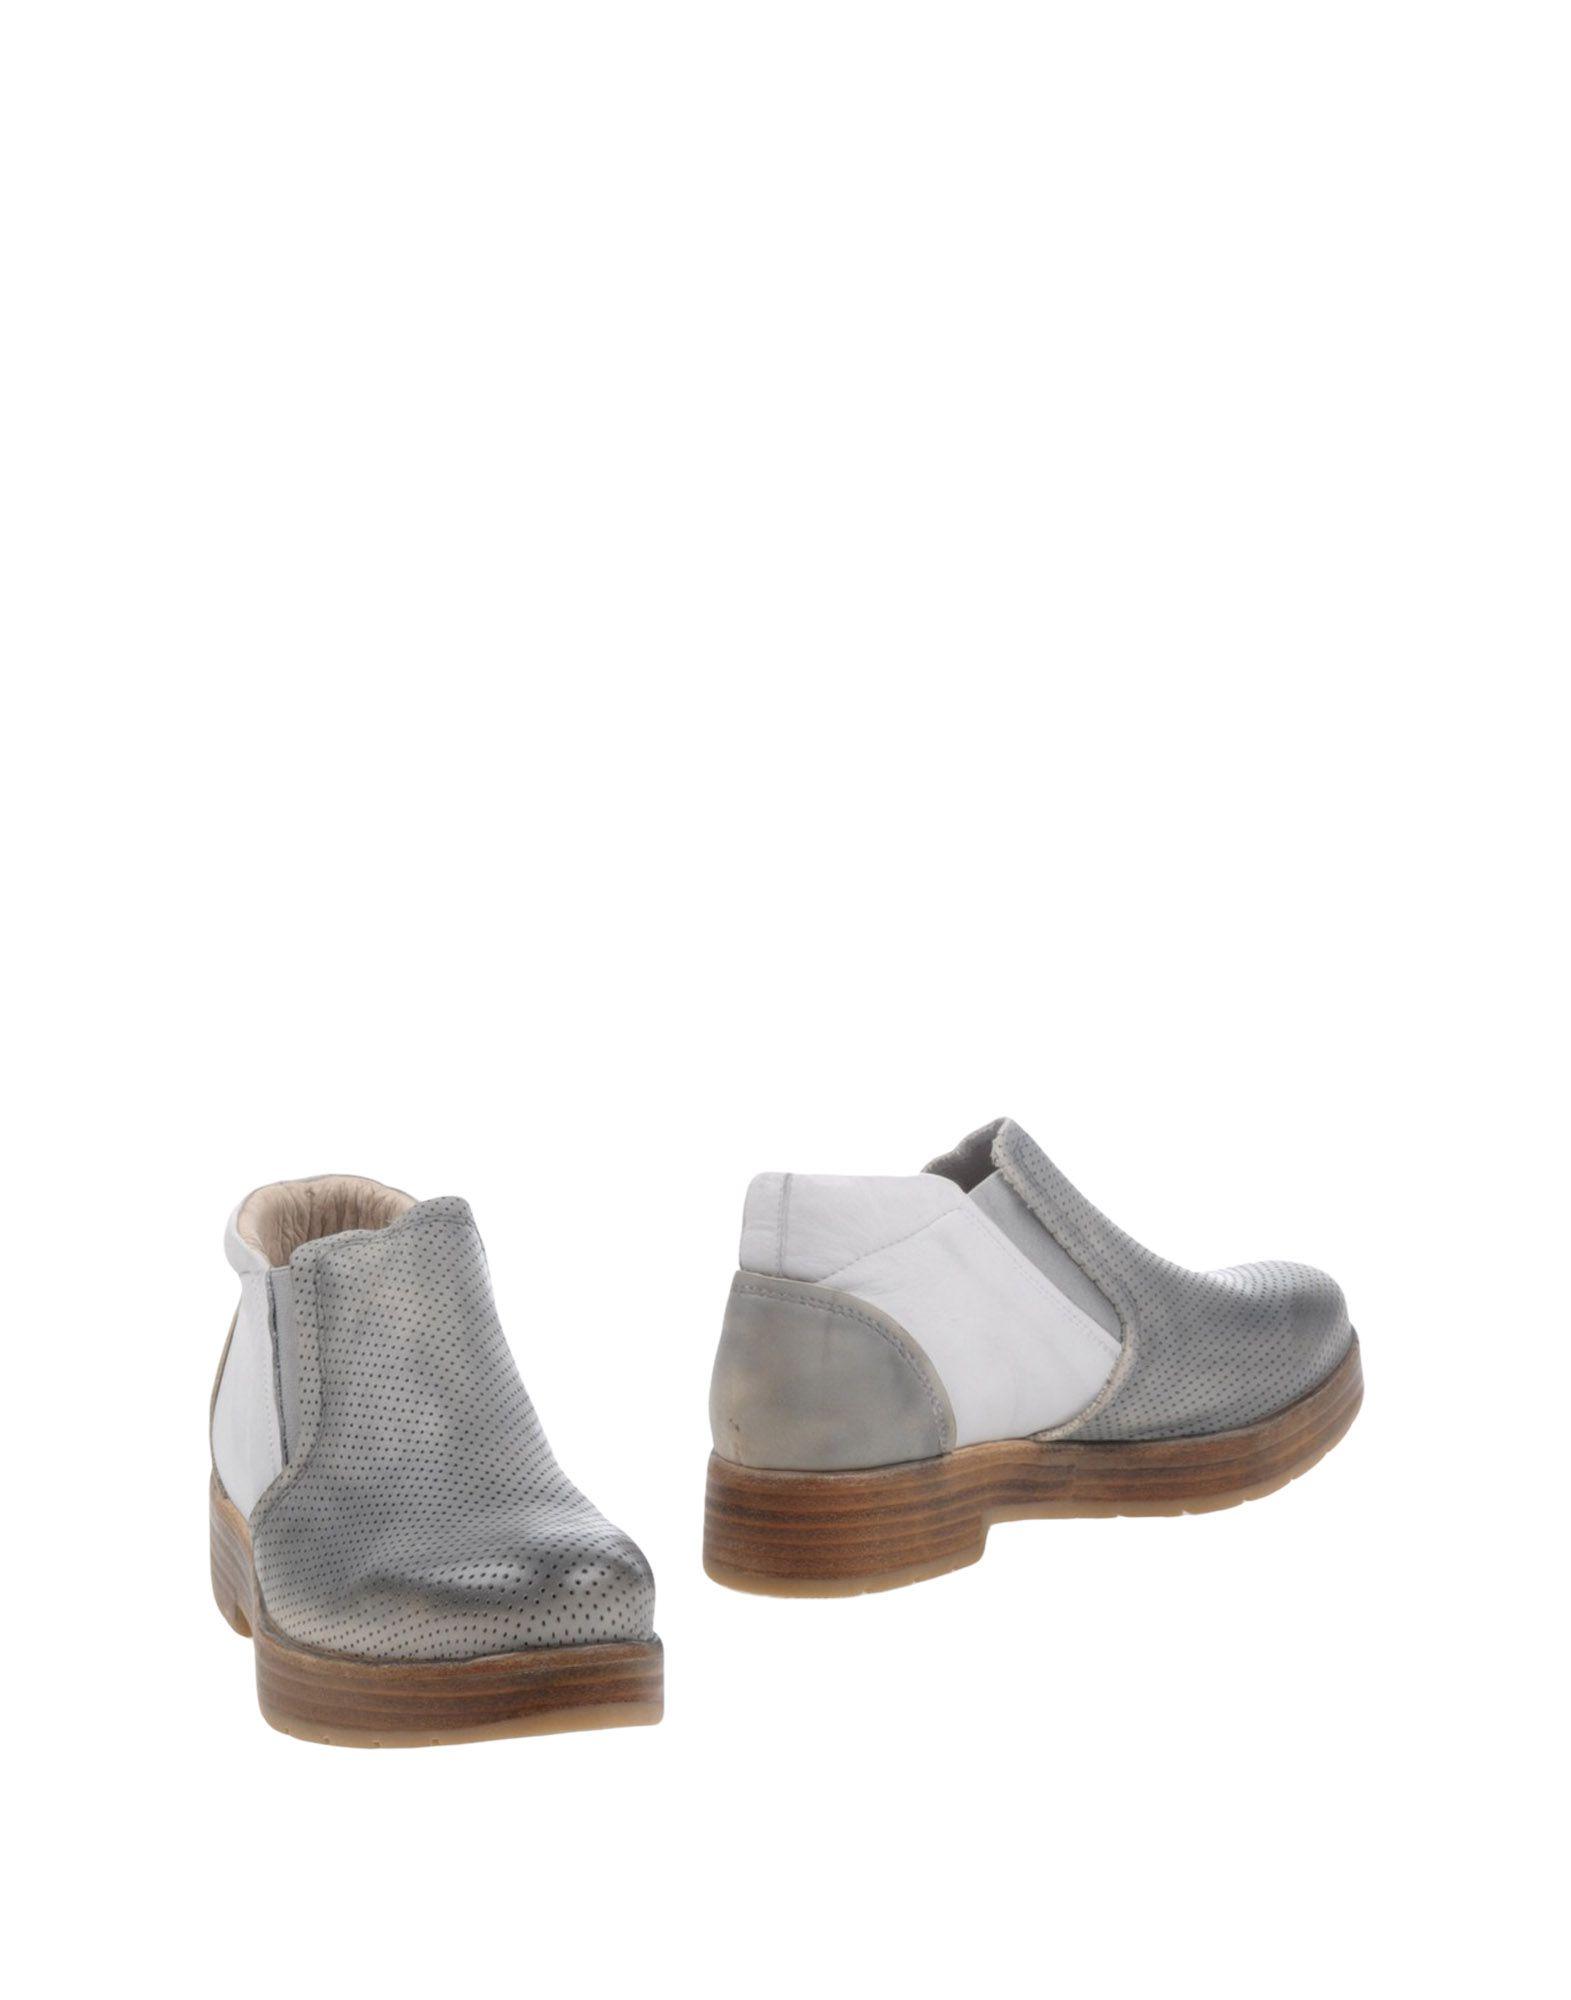 HANGAR Полусапоги и высокие ботинки magazzini del sale полусапоги и высокие ботинки